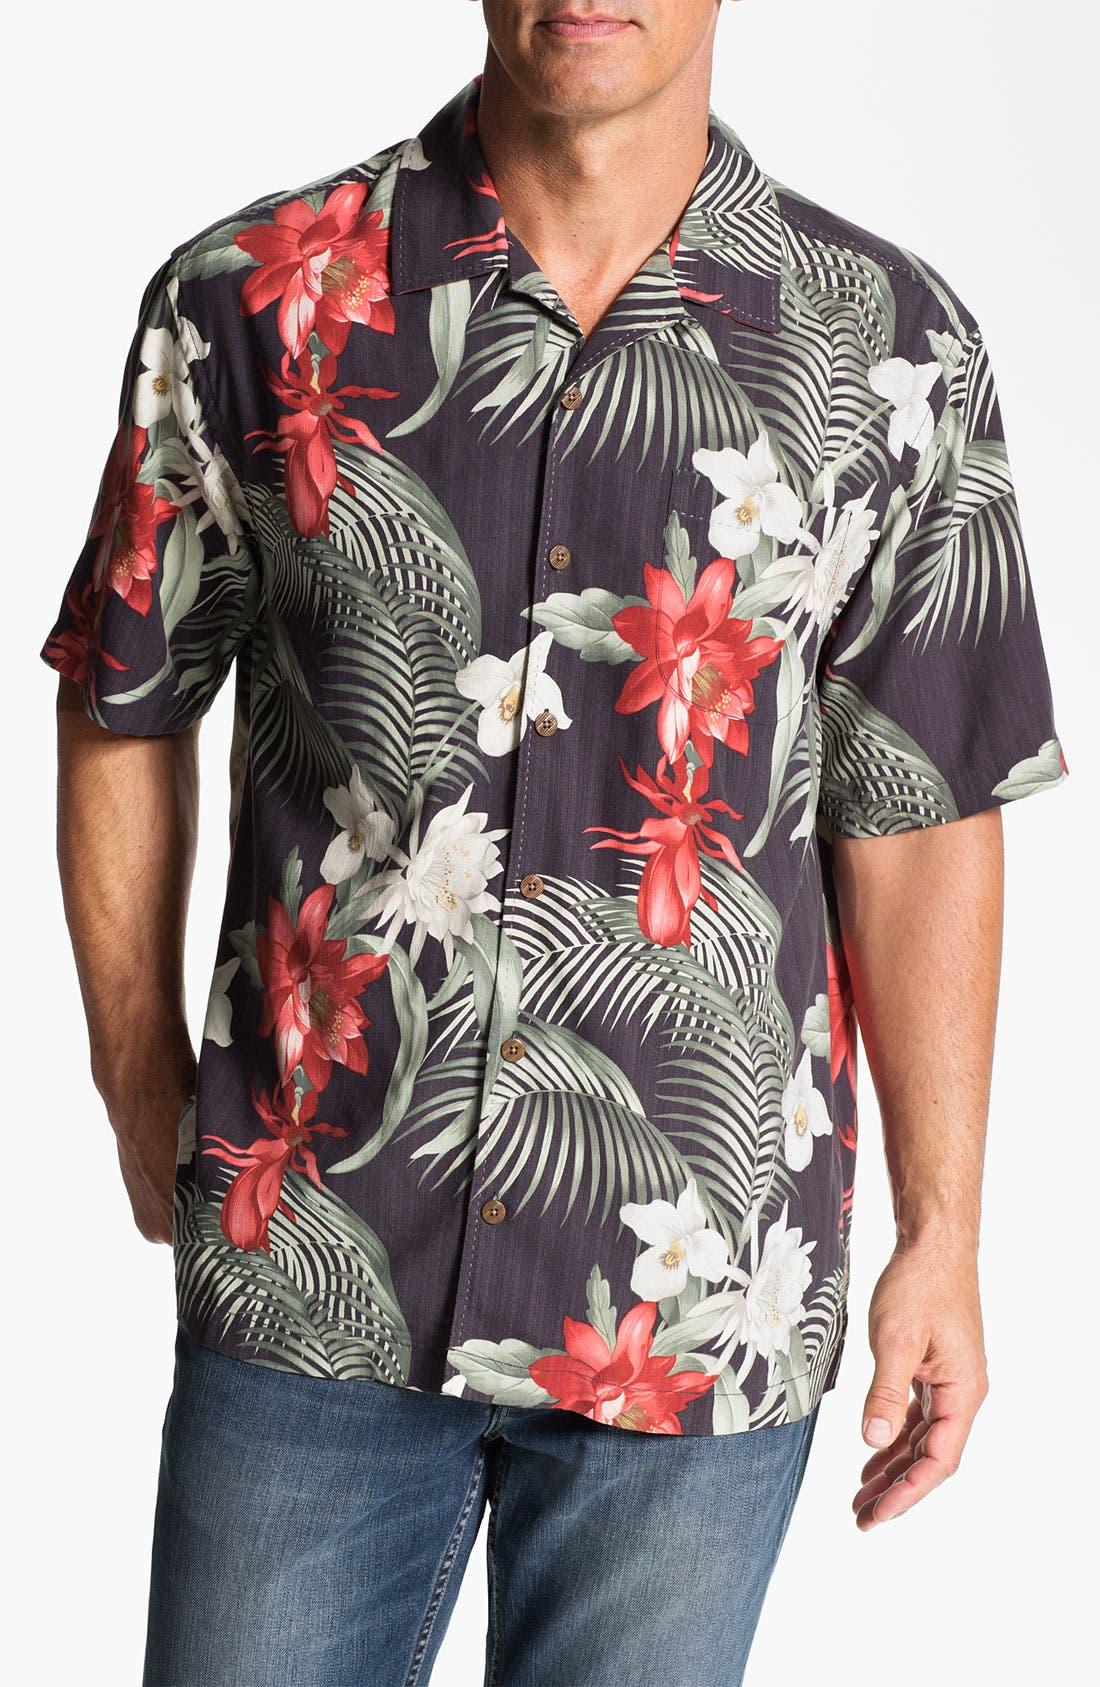 Alternate Image 1 Selected - Tommy Bahama 'Mediterranean Breeze' Silk Campshirt